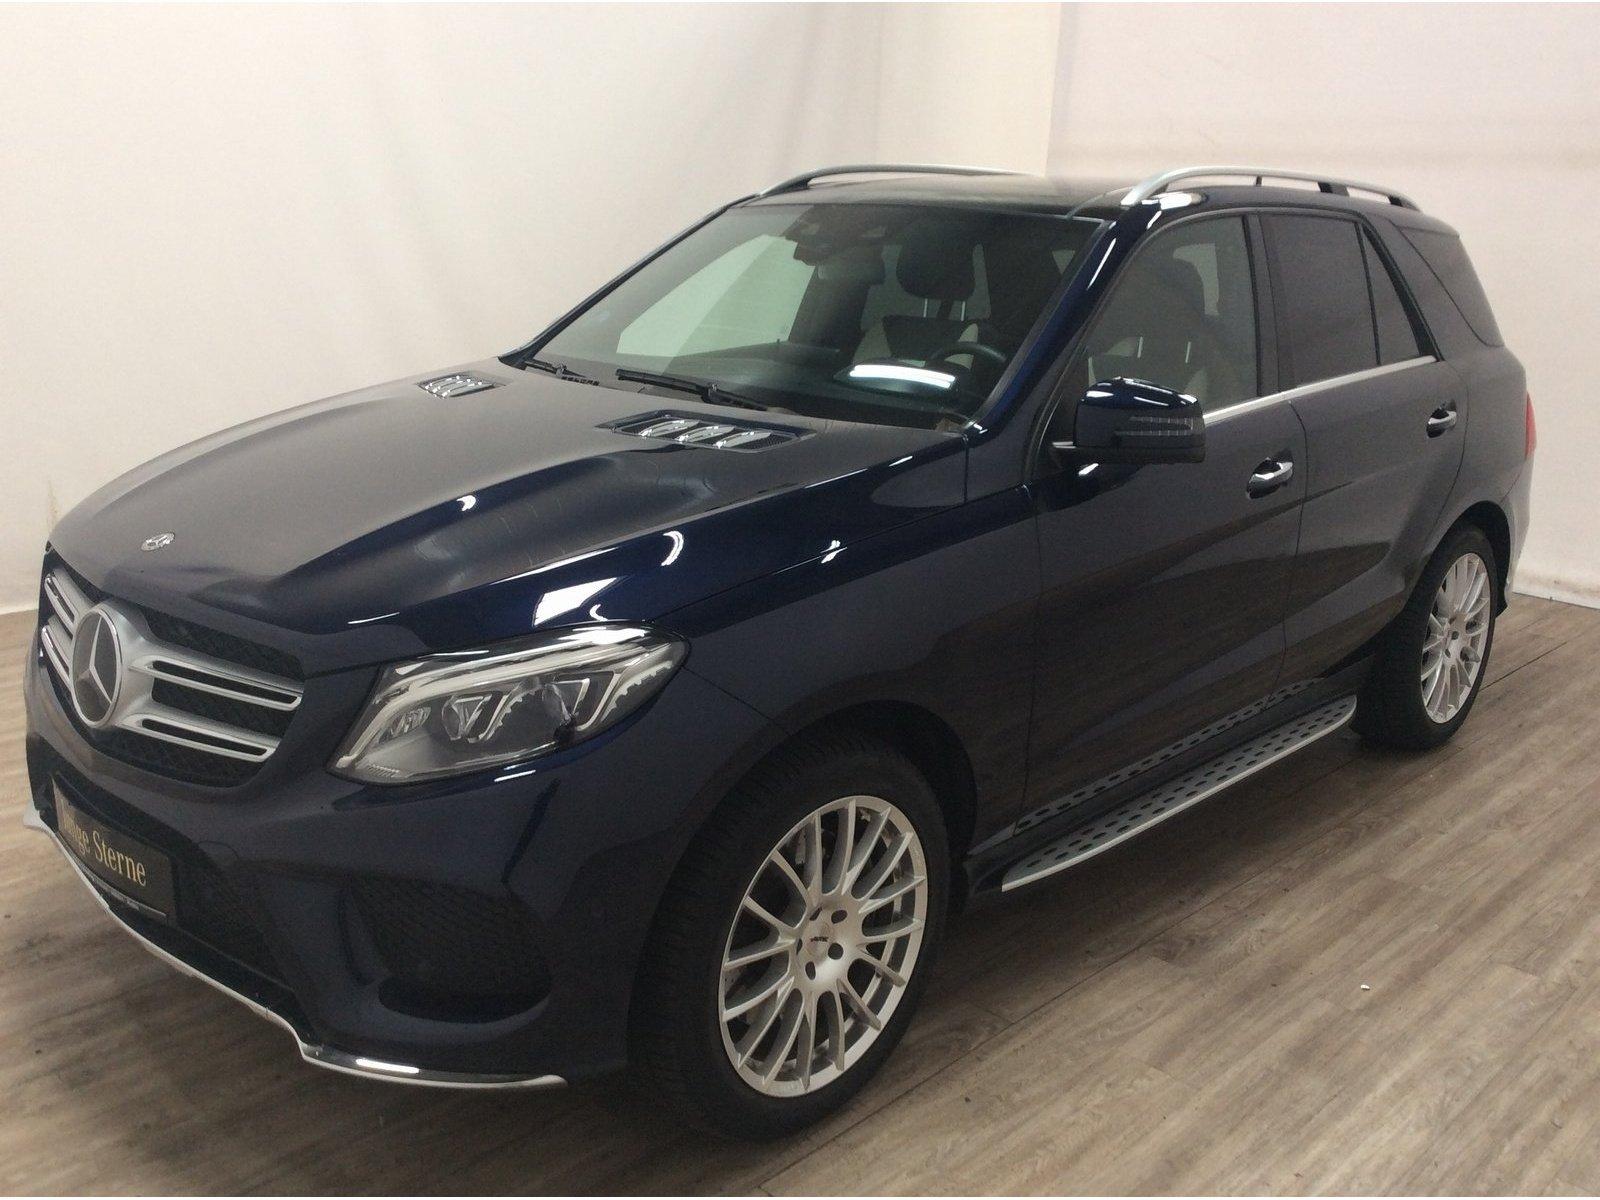 Mercedes-Benz GLE 500 4M AMG *Pano*AHK*Distronic*360°*COMAND*, Jahr 2018, Benzin